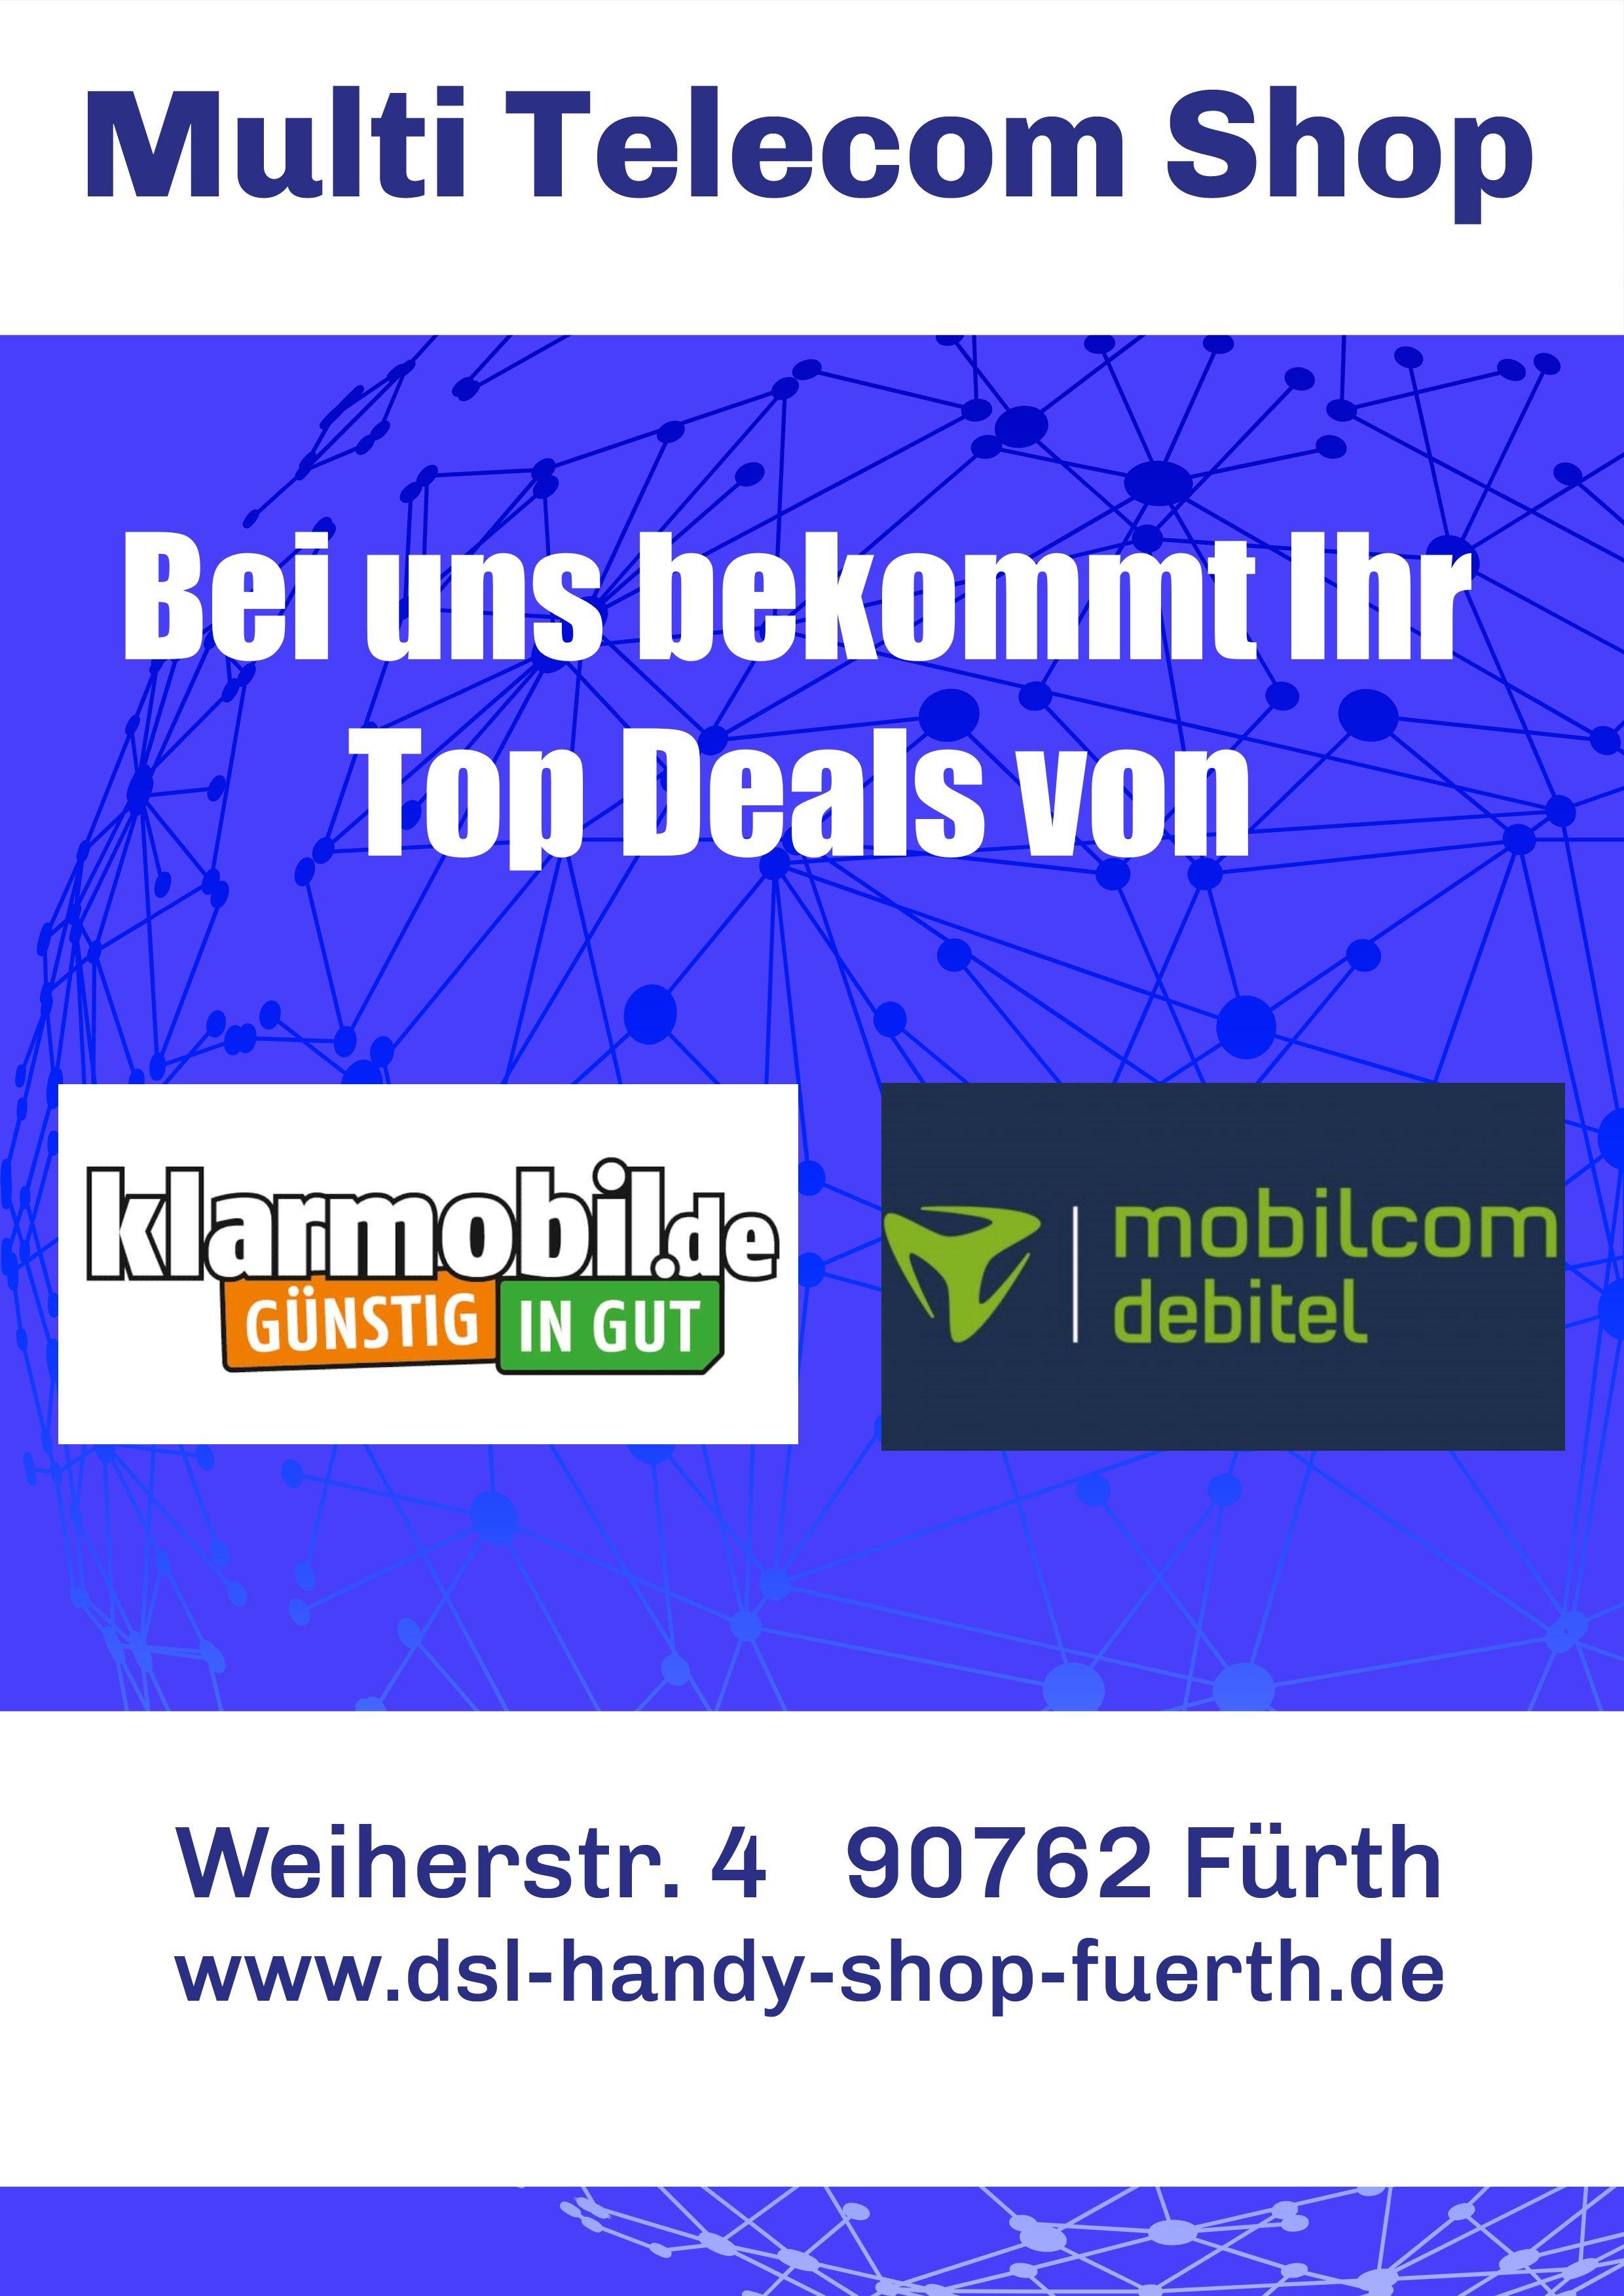 Mobilcom Debitel Und Klarmobil Partner Furth Weiherstr 4 In 2020 Handy Shop Handyvertrag Handy